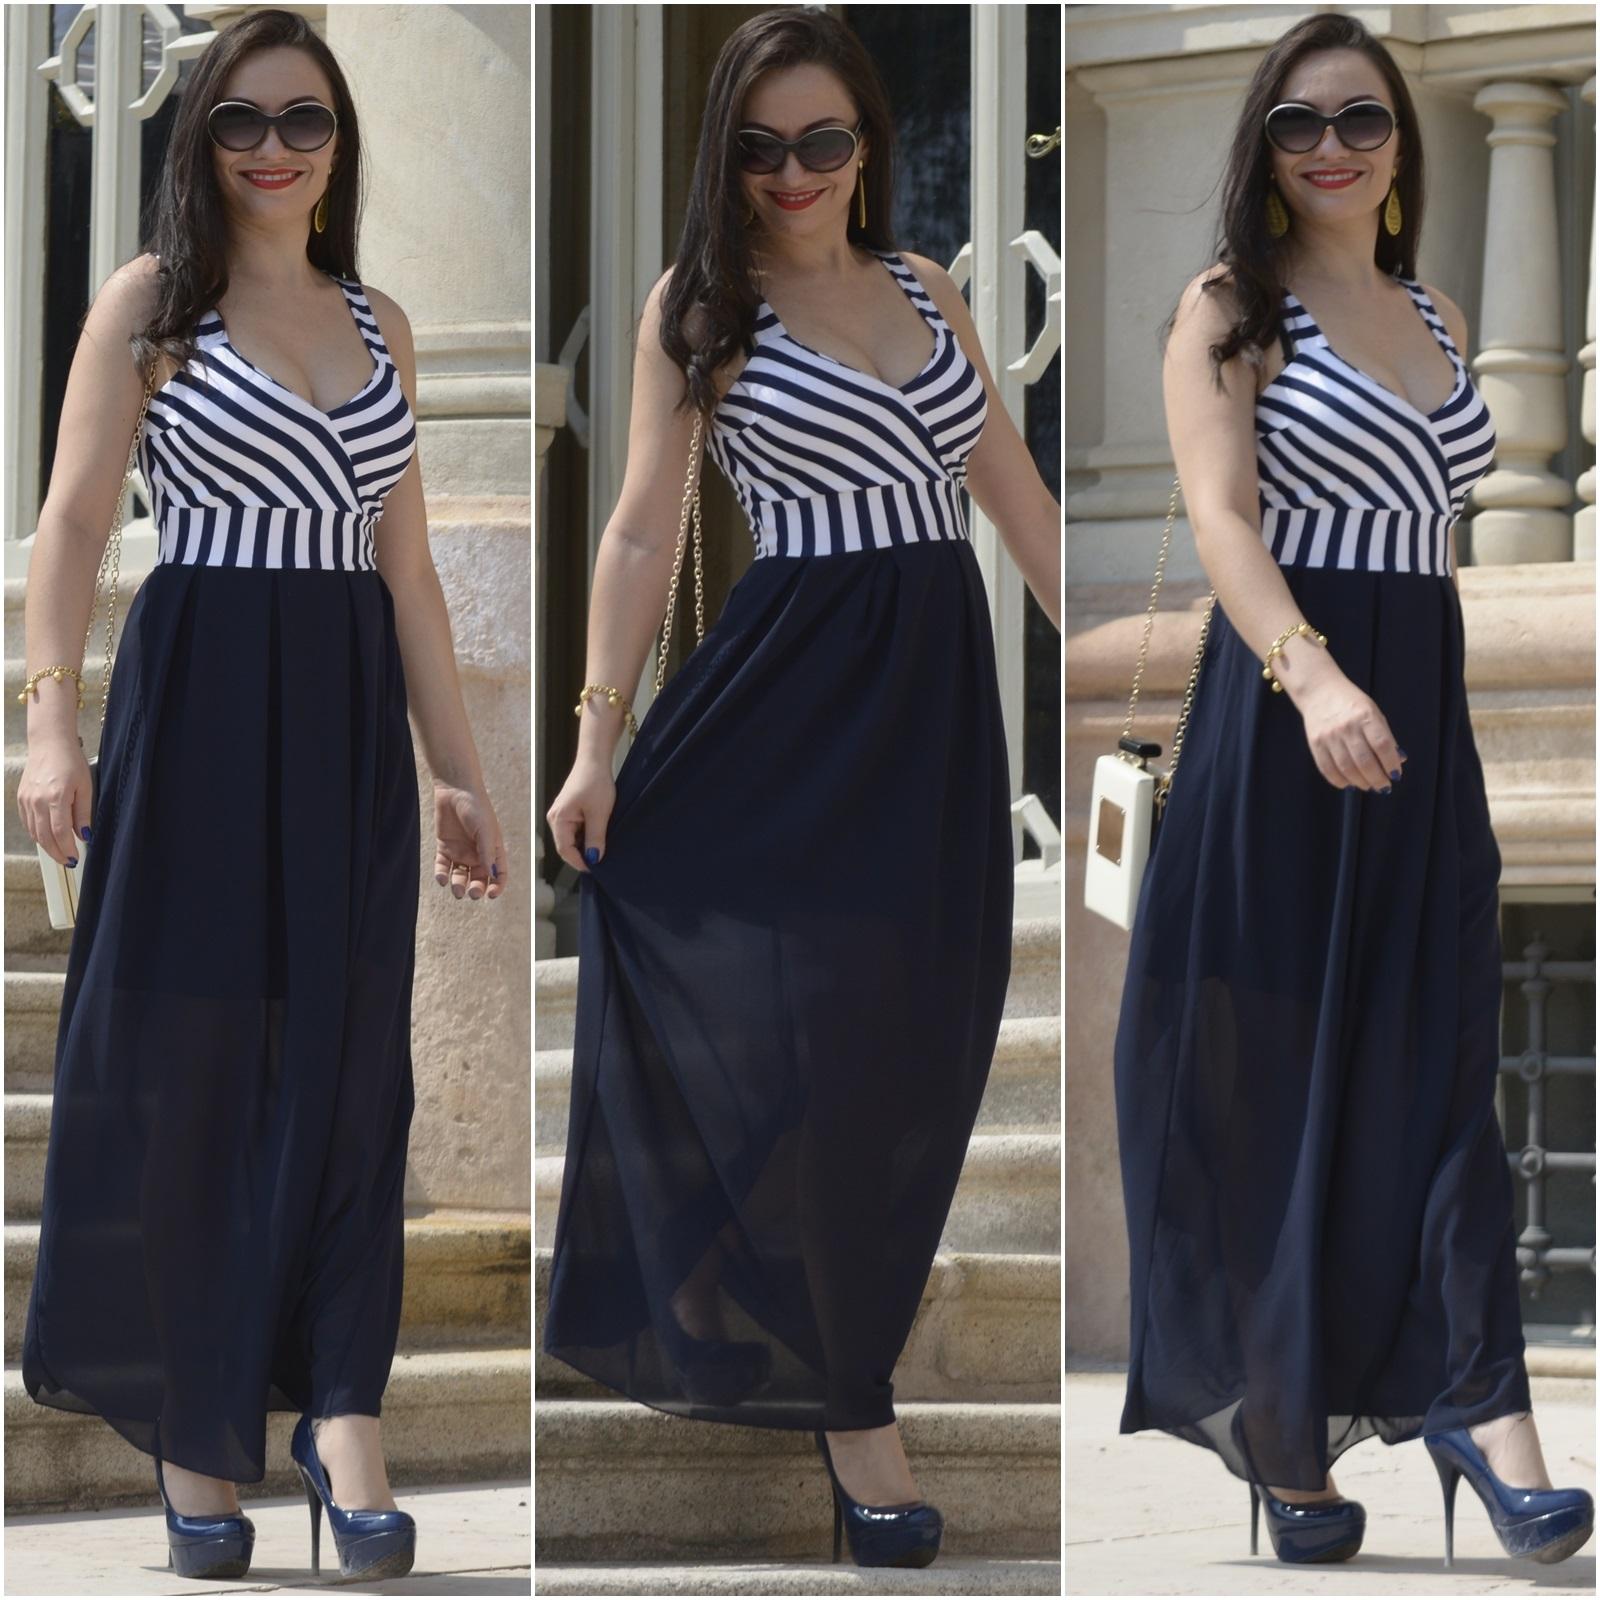 vestido-estilo-navy-longo-nathália-ferrara-9